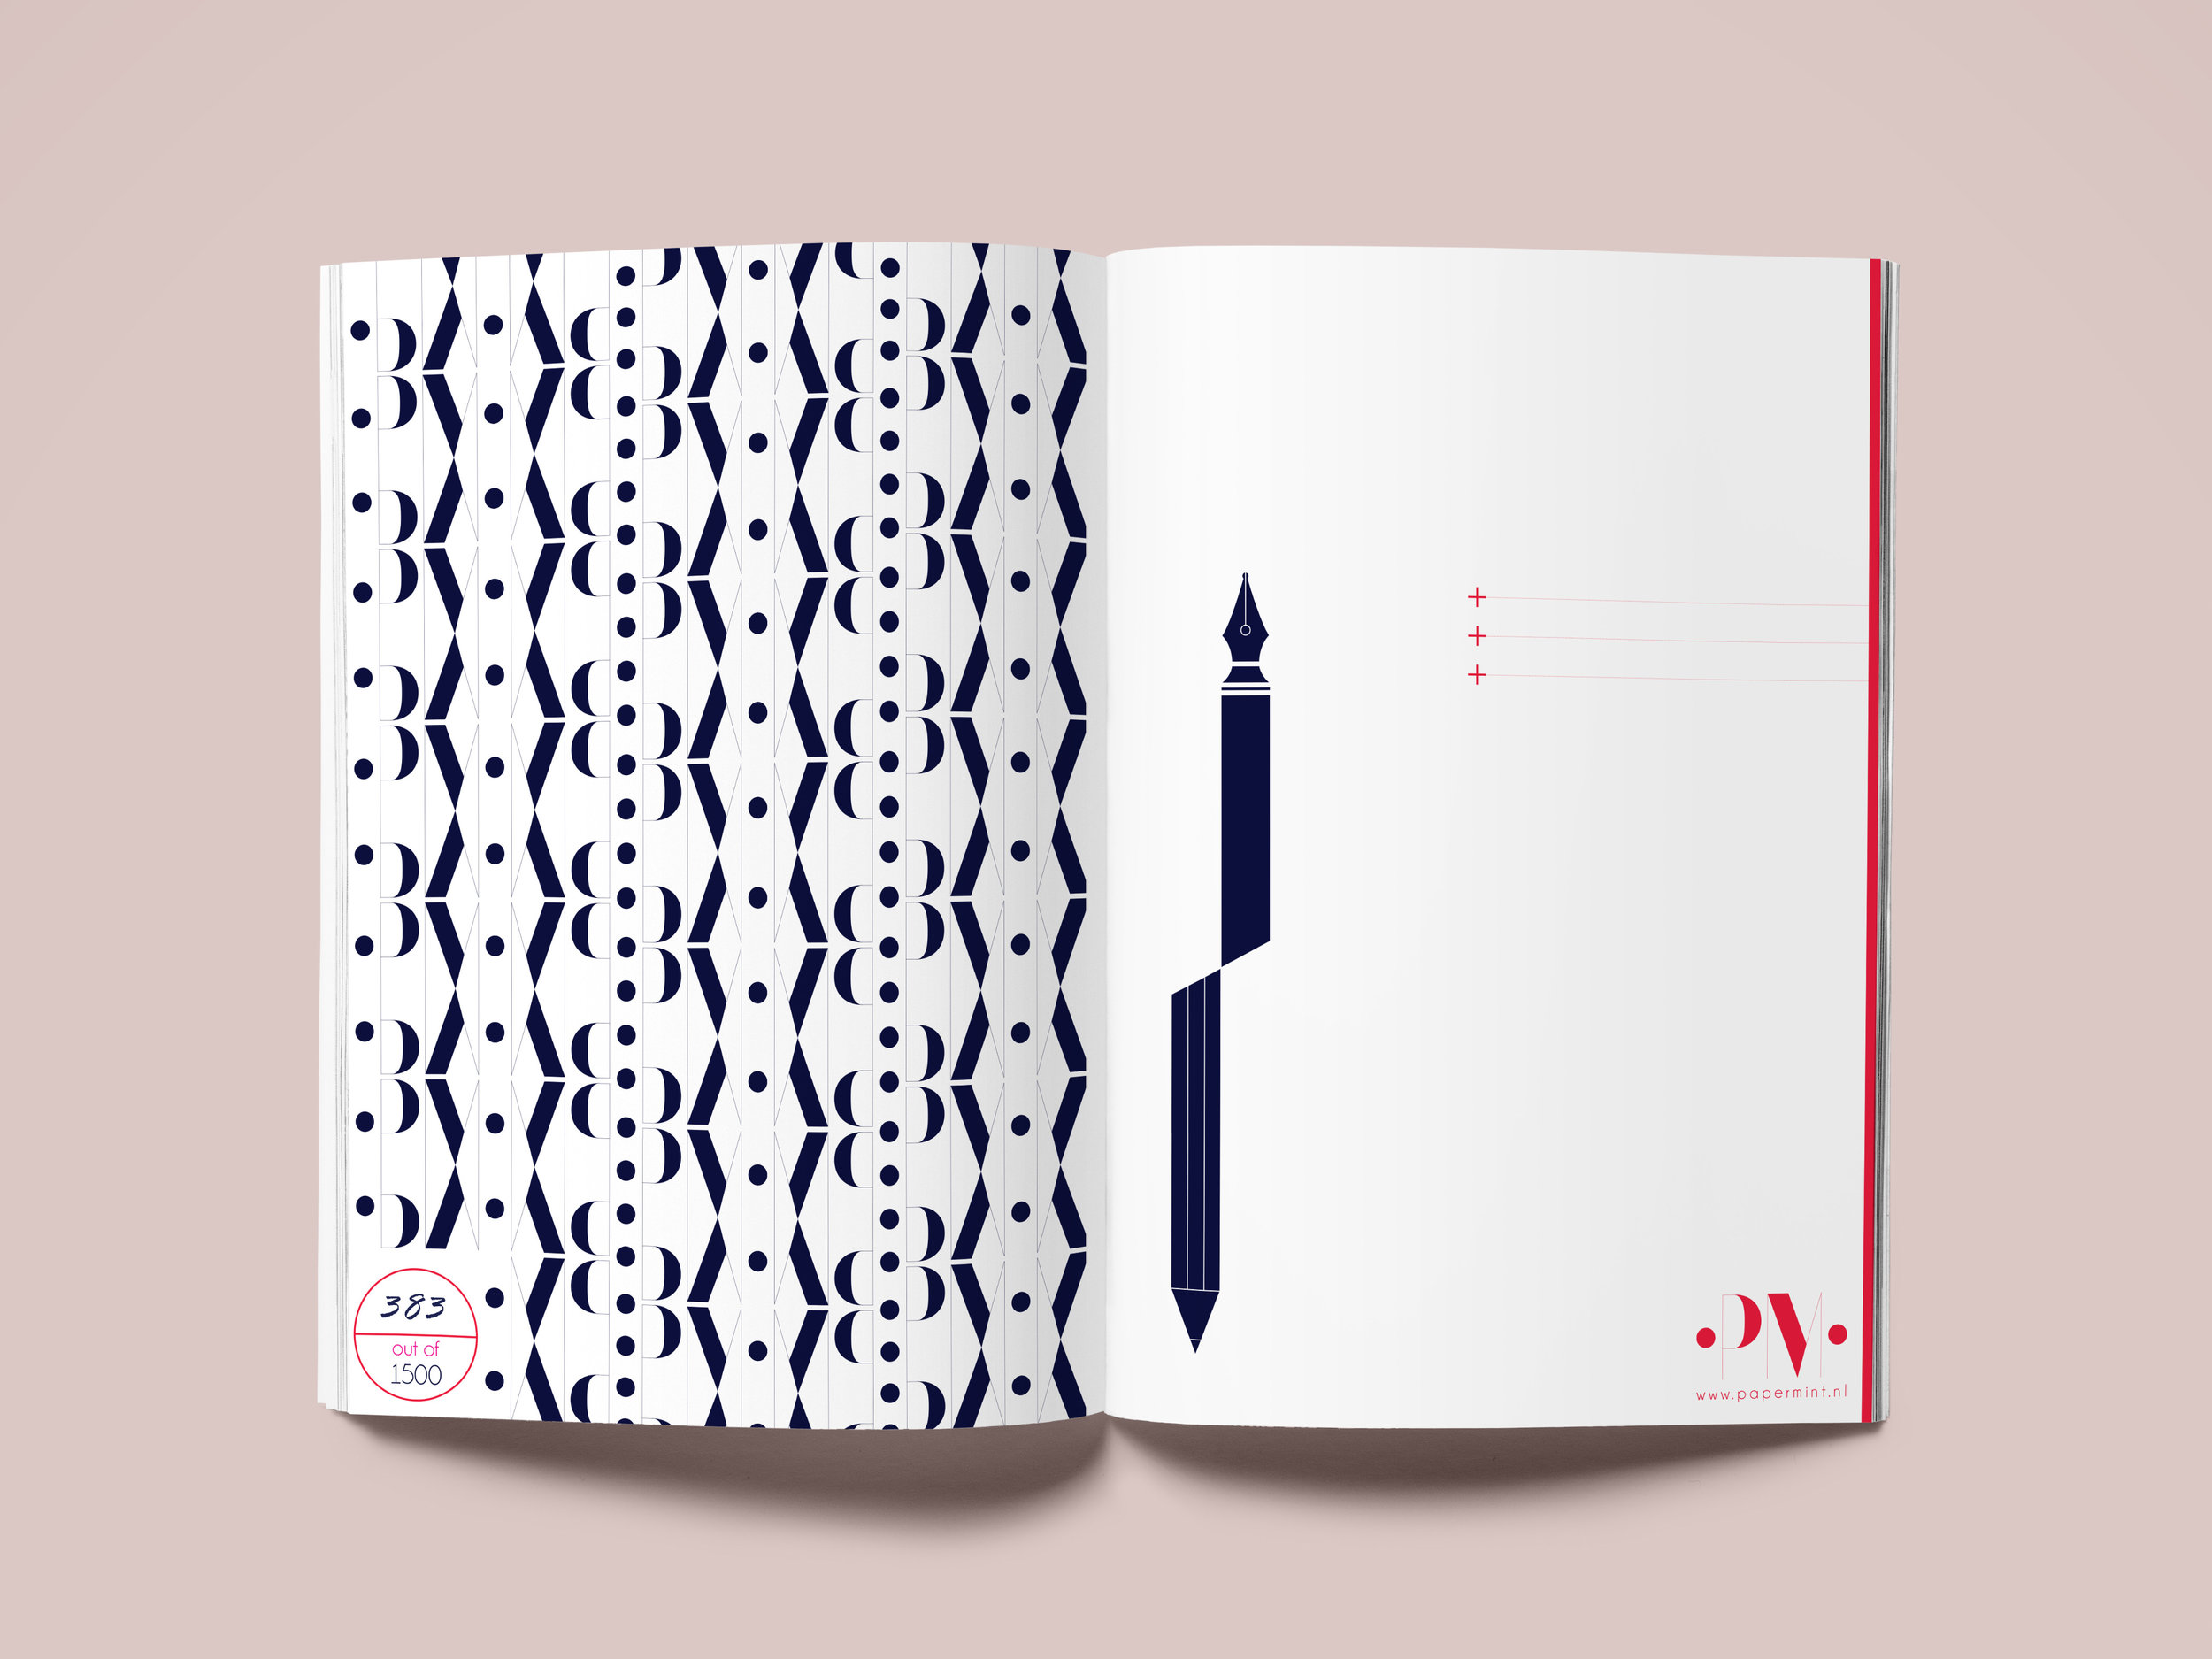 Designerette.nl_Papermint.jpg